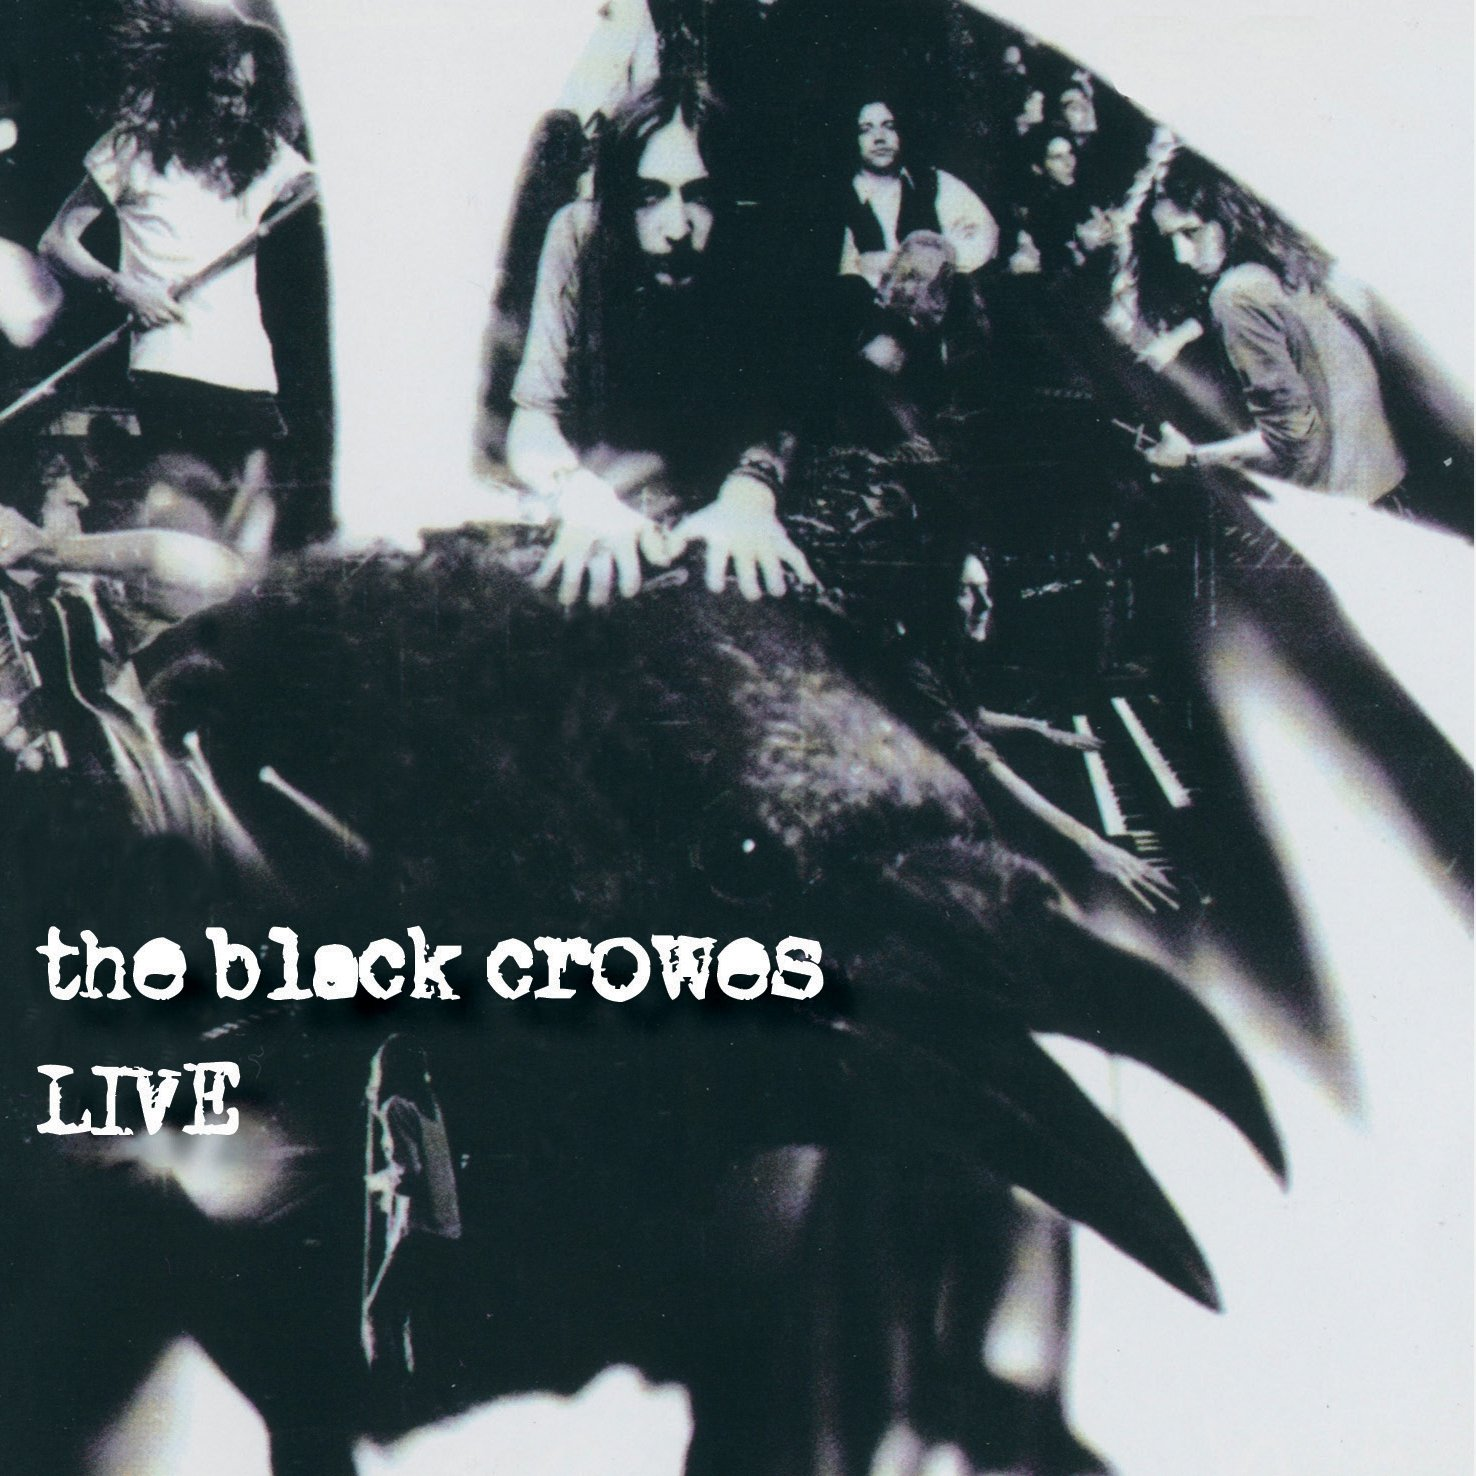 The Black Crowes, el topic - Página 17 81Nh9u1BqML._SL1476_